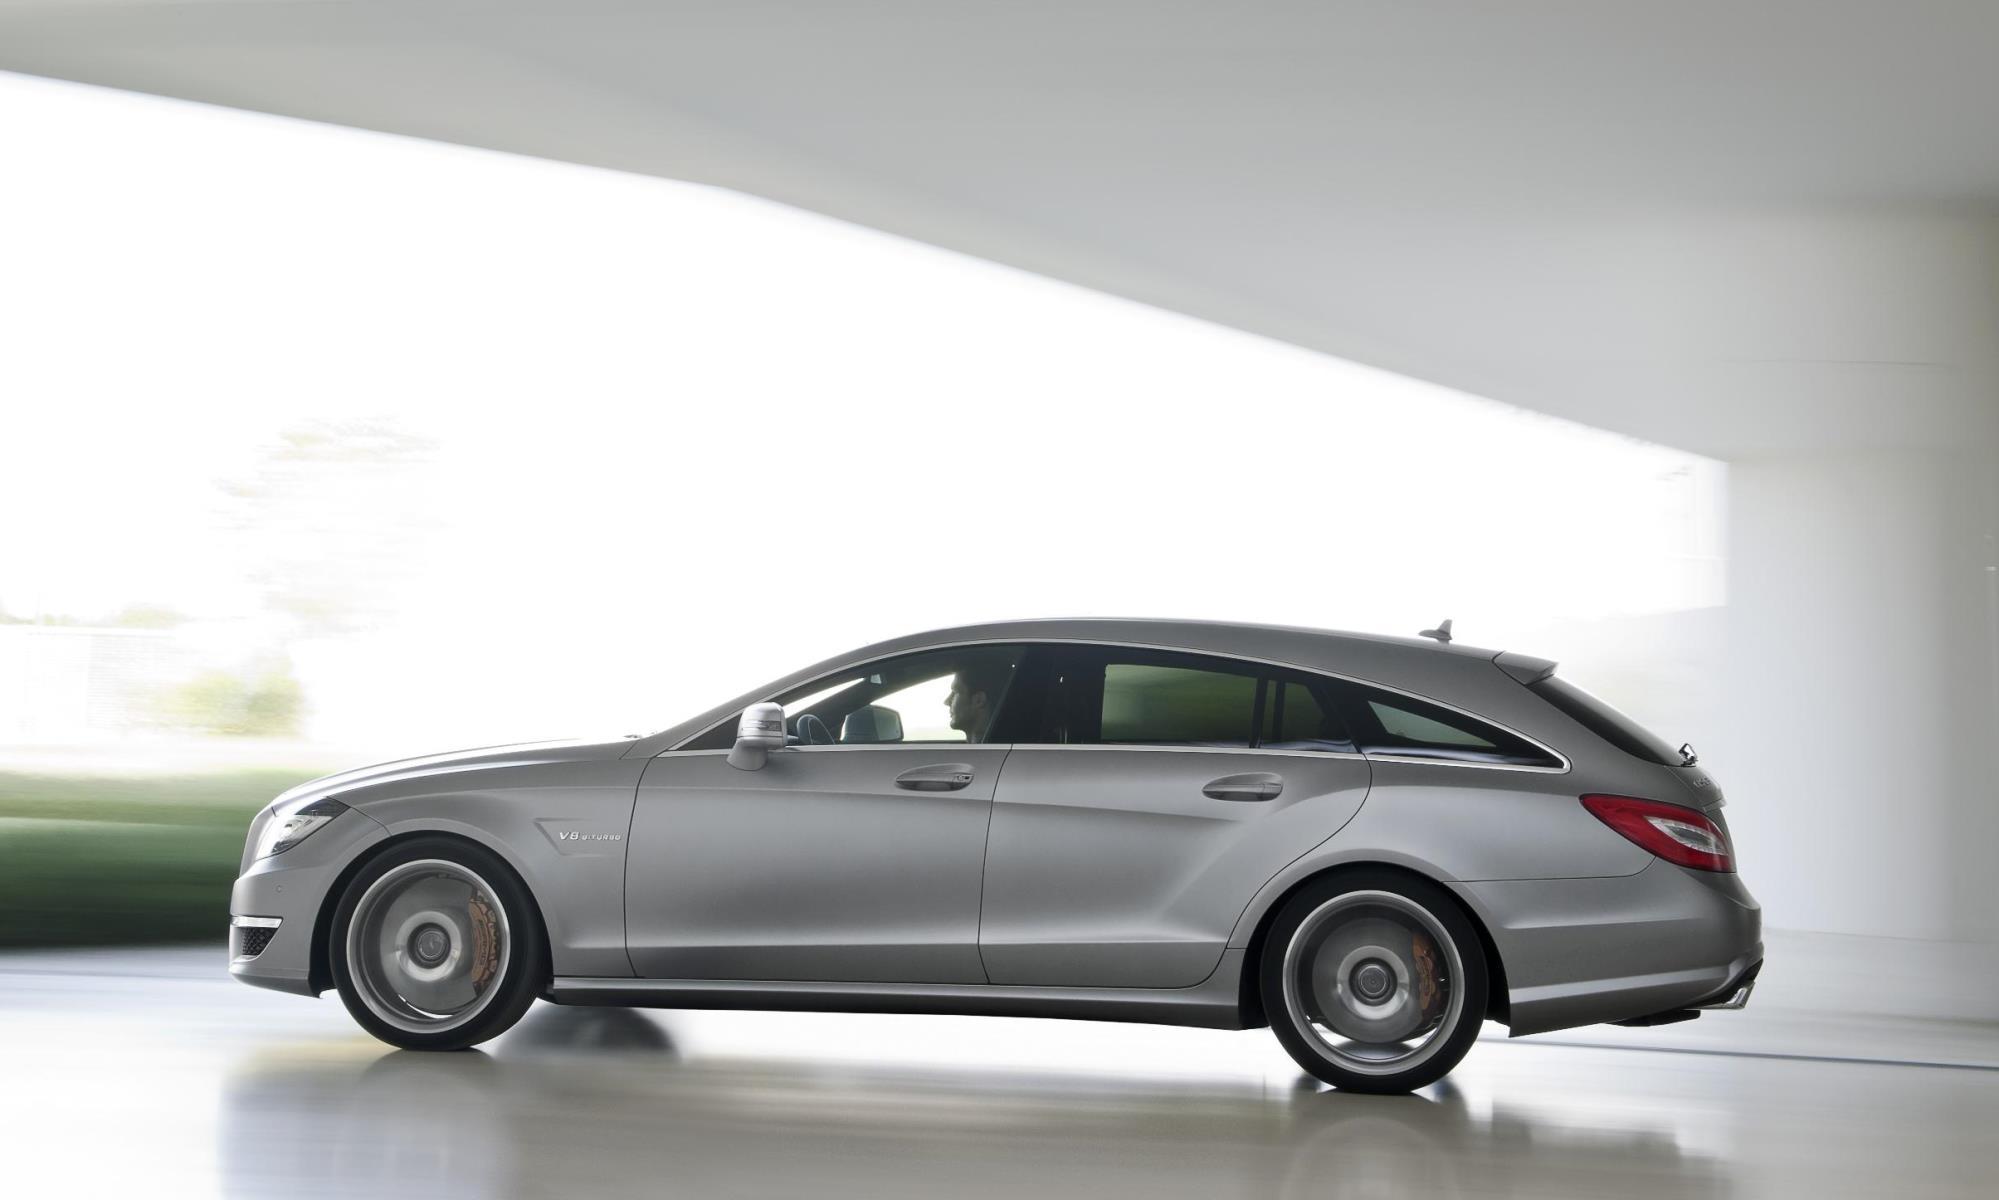 Mercedes-AMG CLS63 Shooting Brake